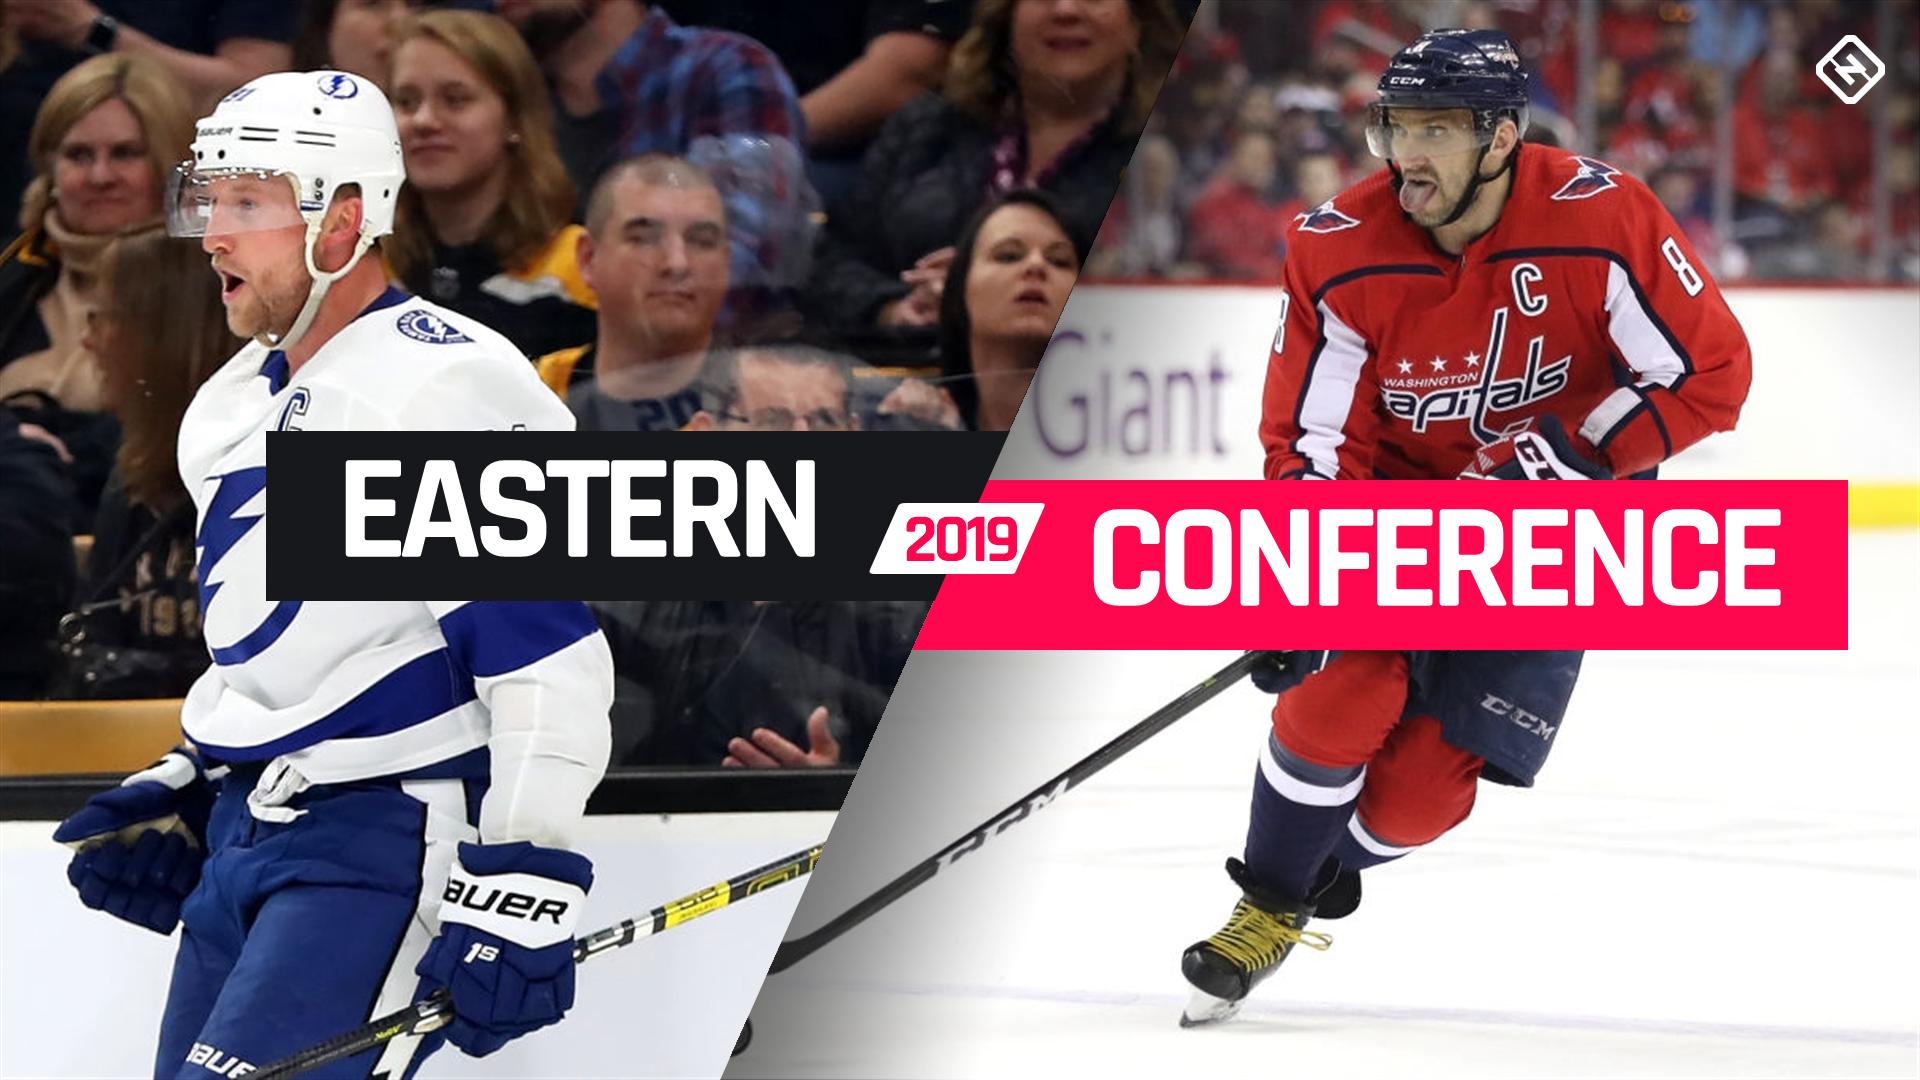 Nhl Playoffs Bracket 2019 Eastern Conference Series Picks